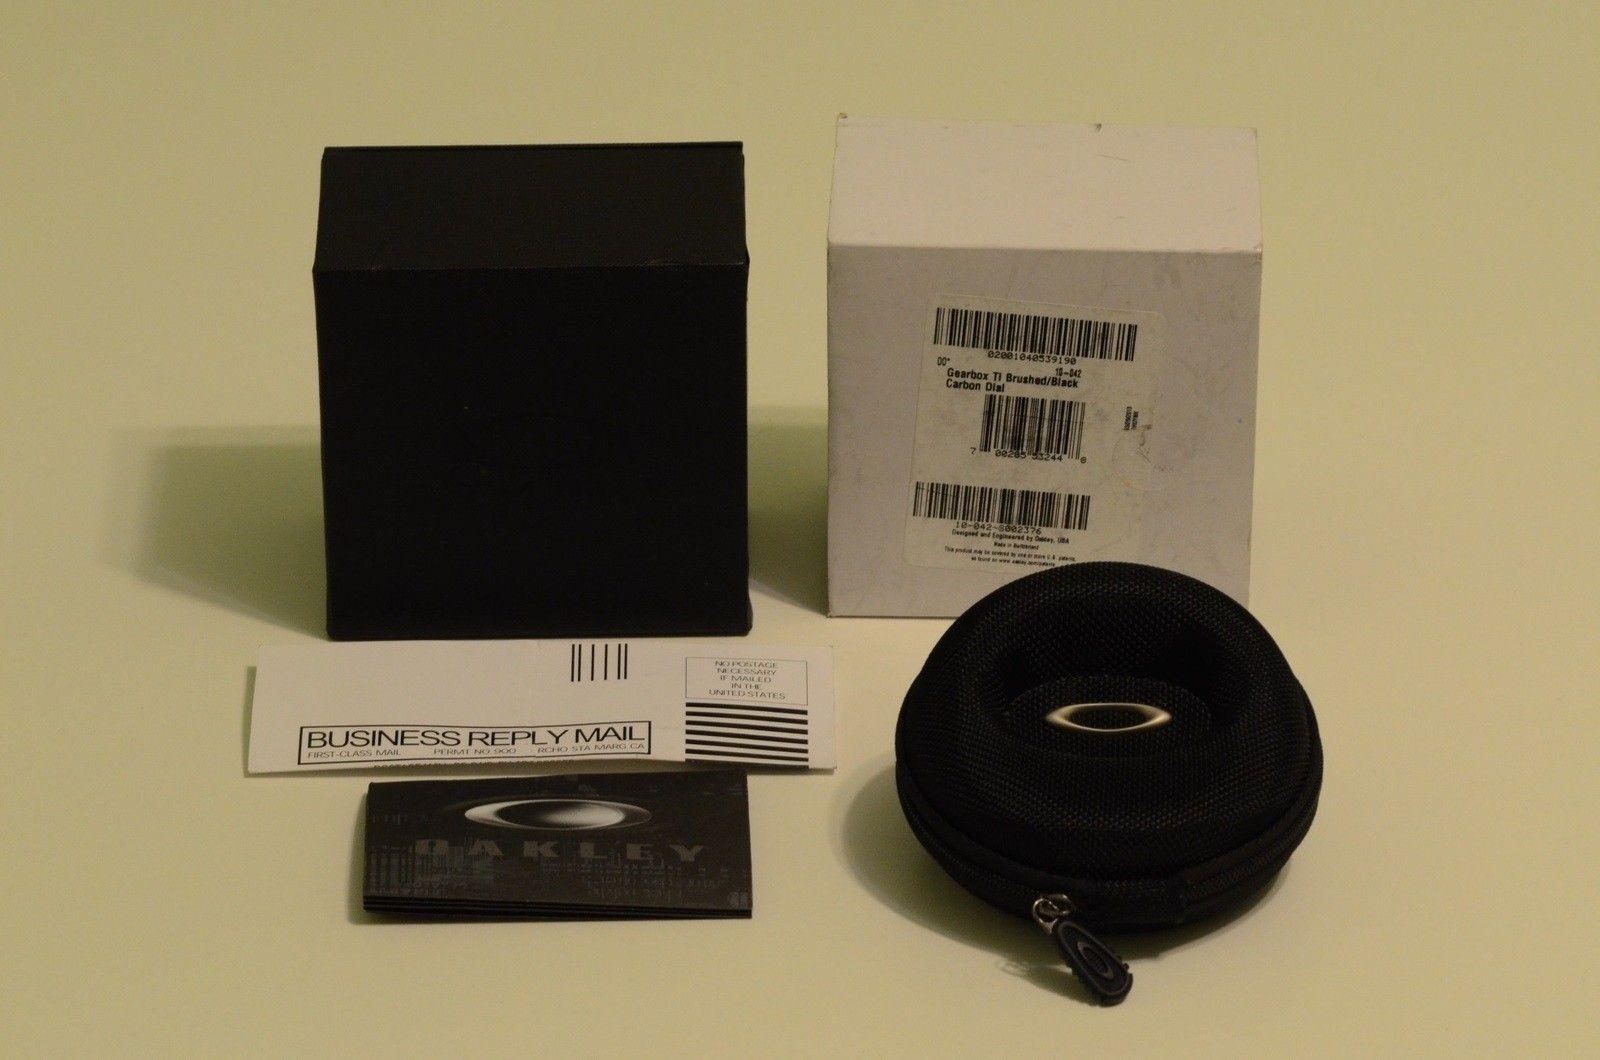 Gearbox Brushed Titanium- Carbon Fiber Dial SOLD! - DSC_0438.JPG